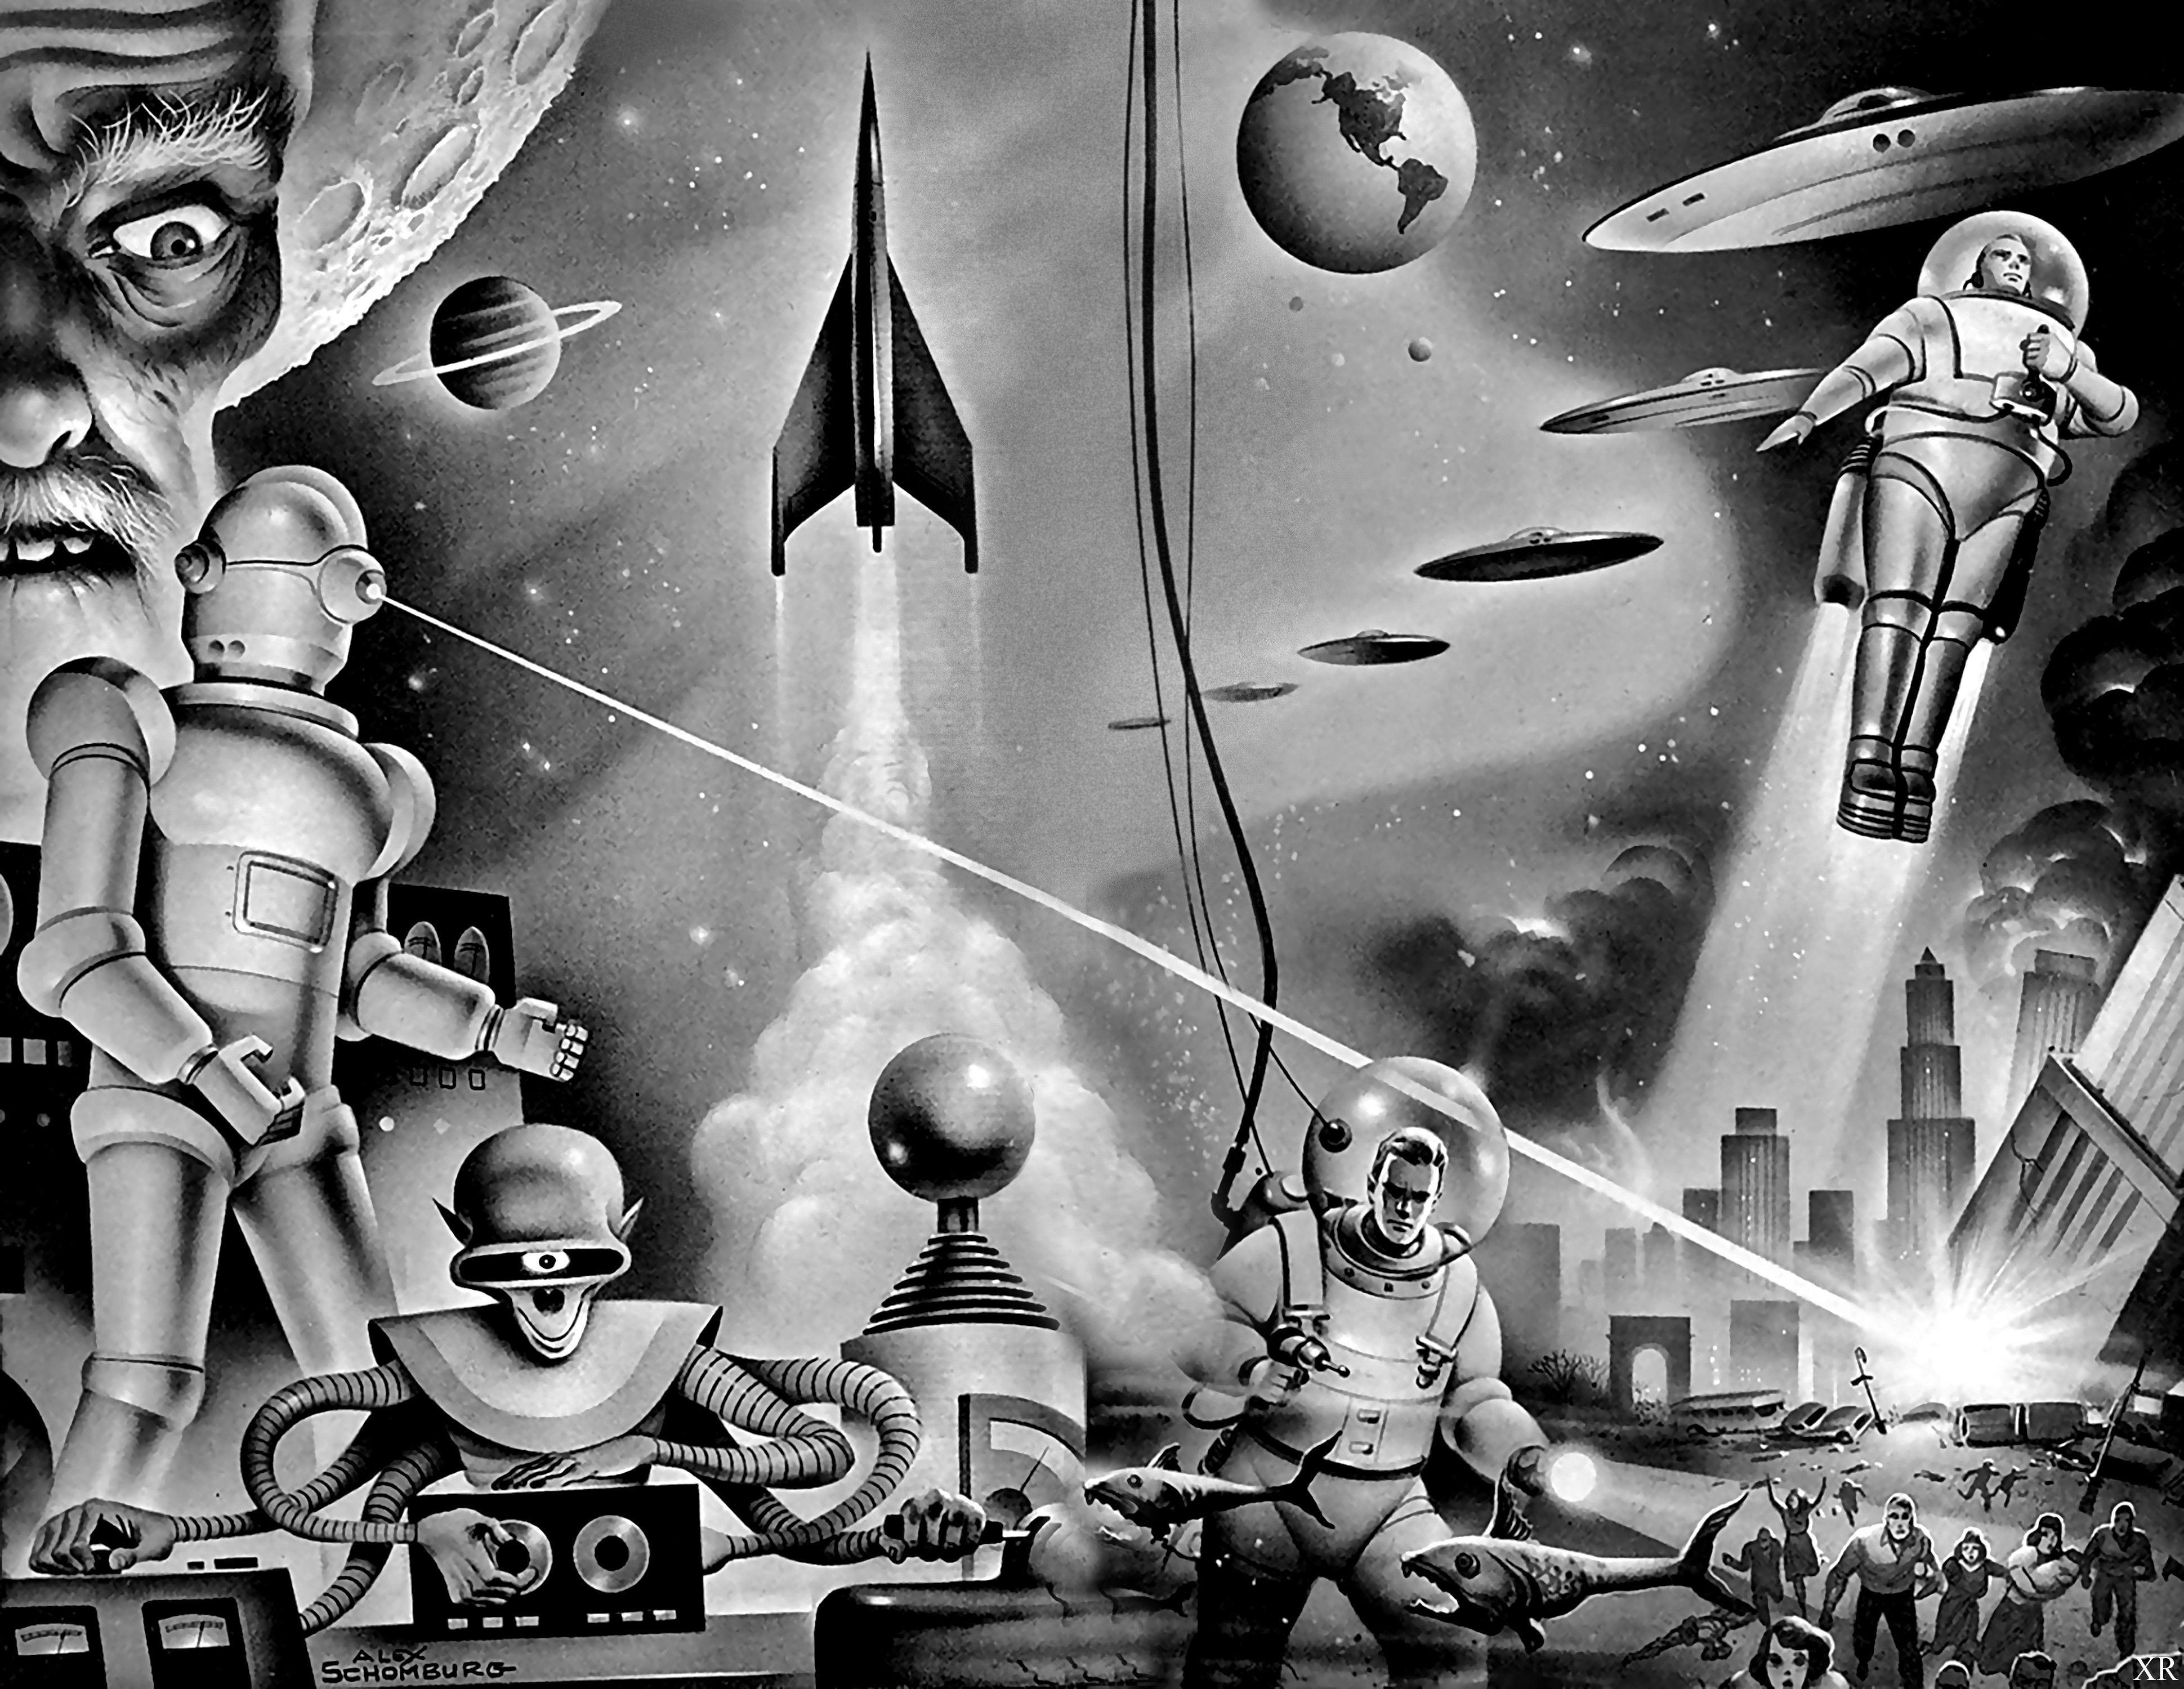 Retro Sci Fi Gal by JWilsonIllustration on DeviantArt